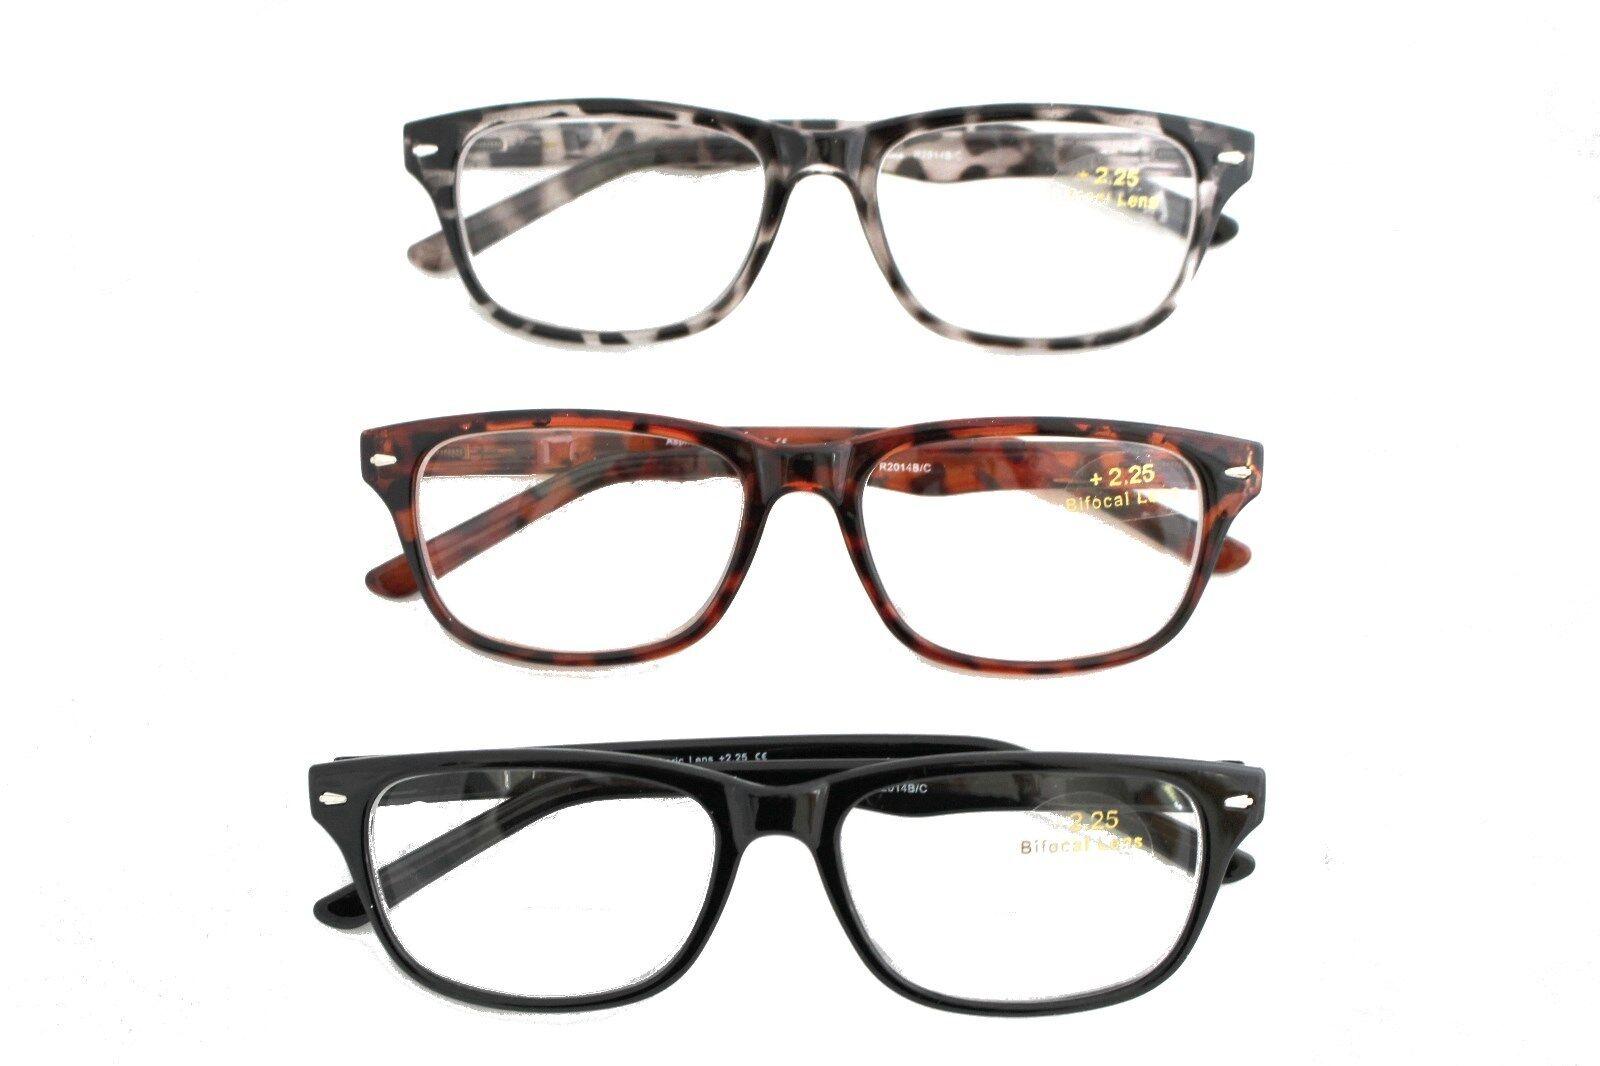 b783c5aaef3 Lightweight BIFOCAL Cheaters Specs Reading Glasses +1.00 - +4.00